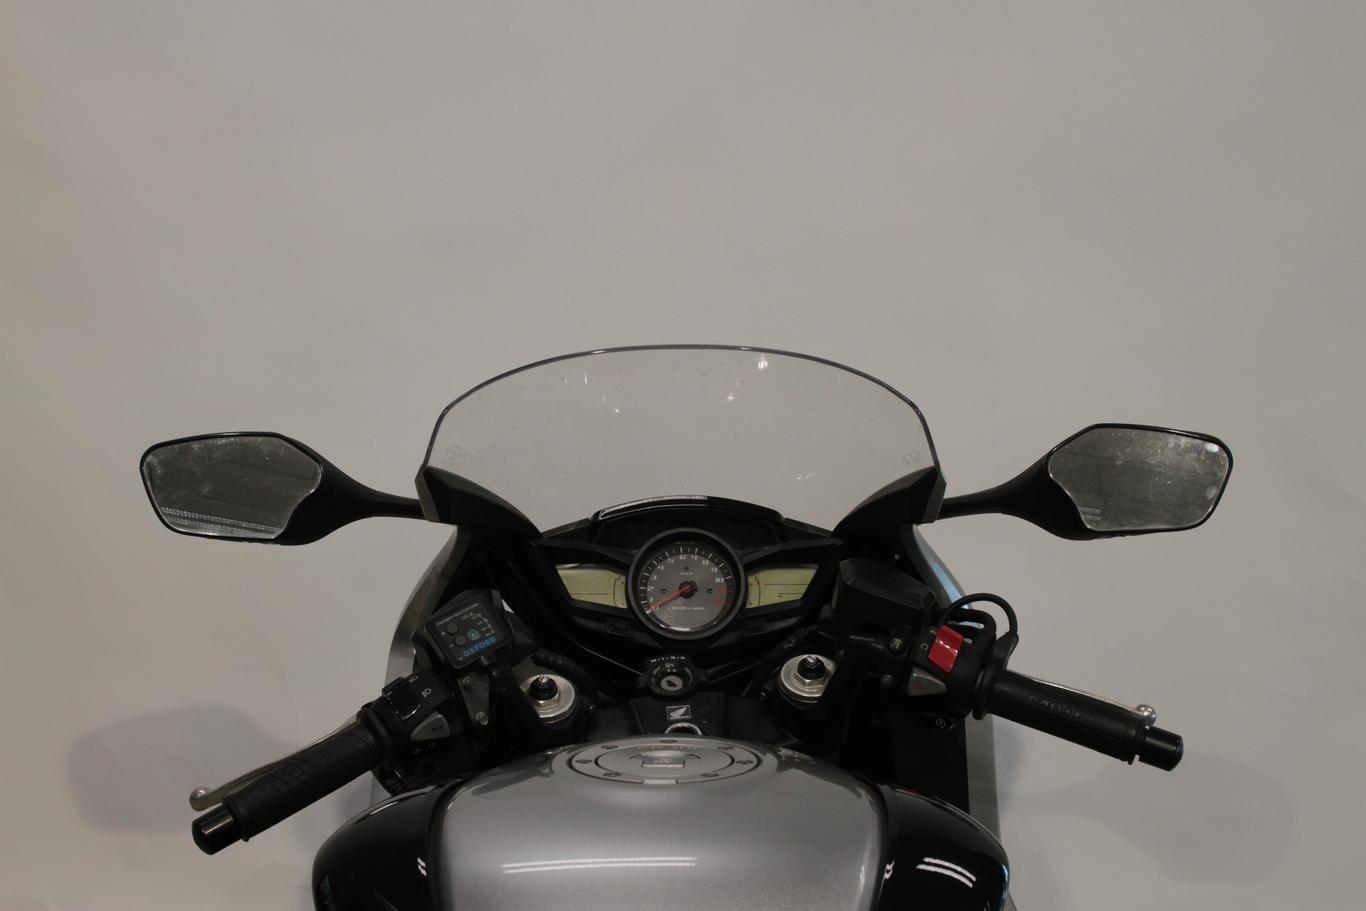 HONDA - VFR1200FA